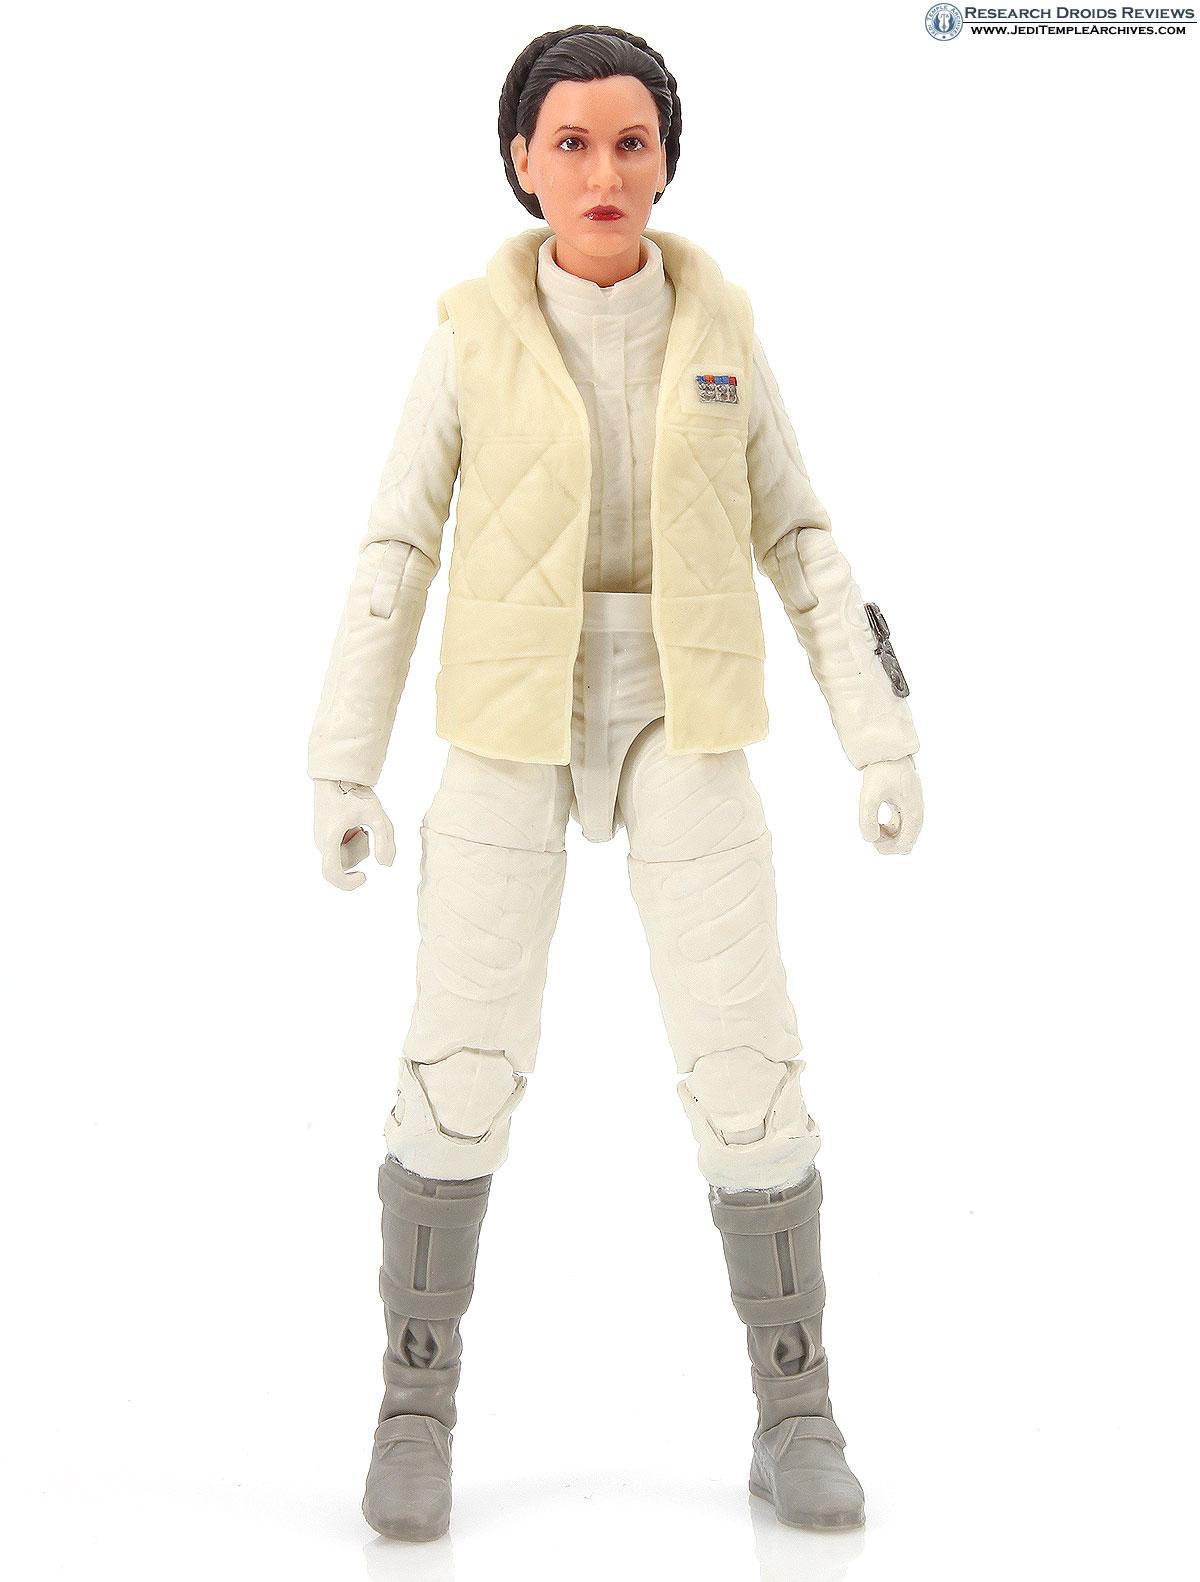 Princess Leia Organa (Hoth)